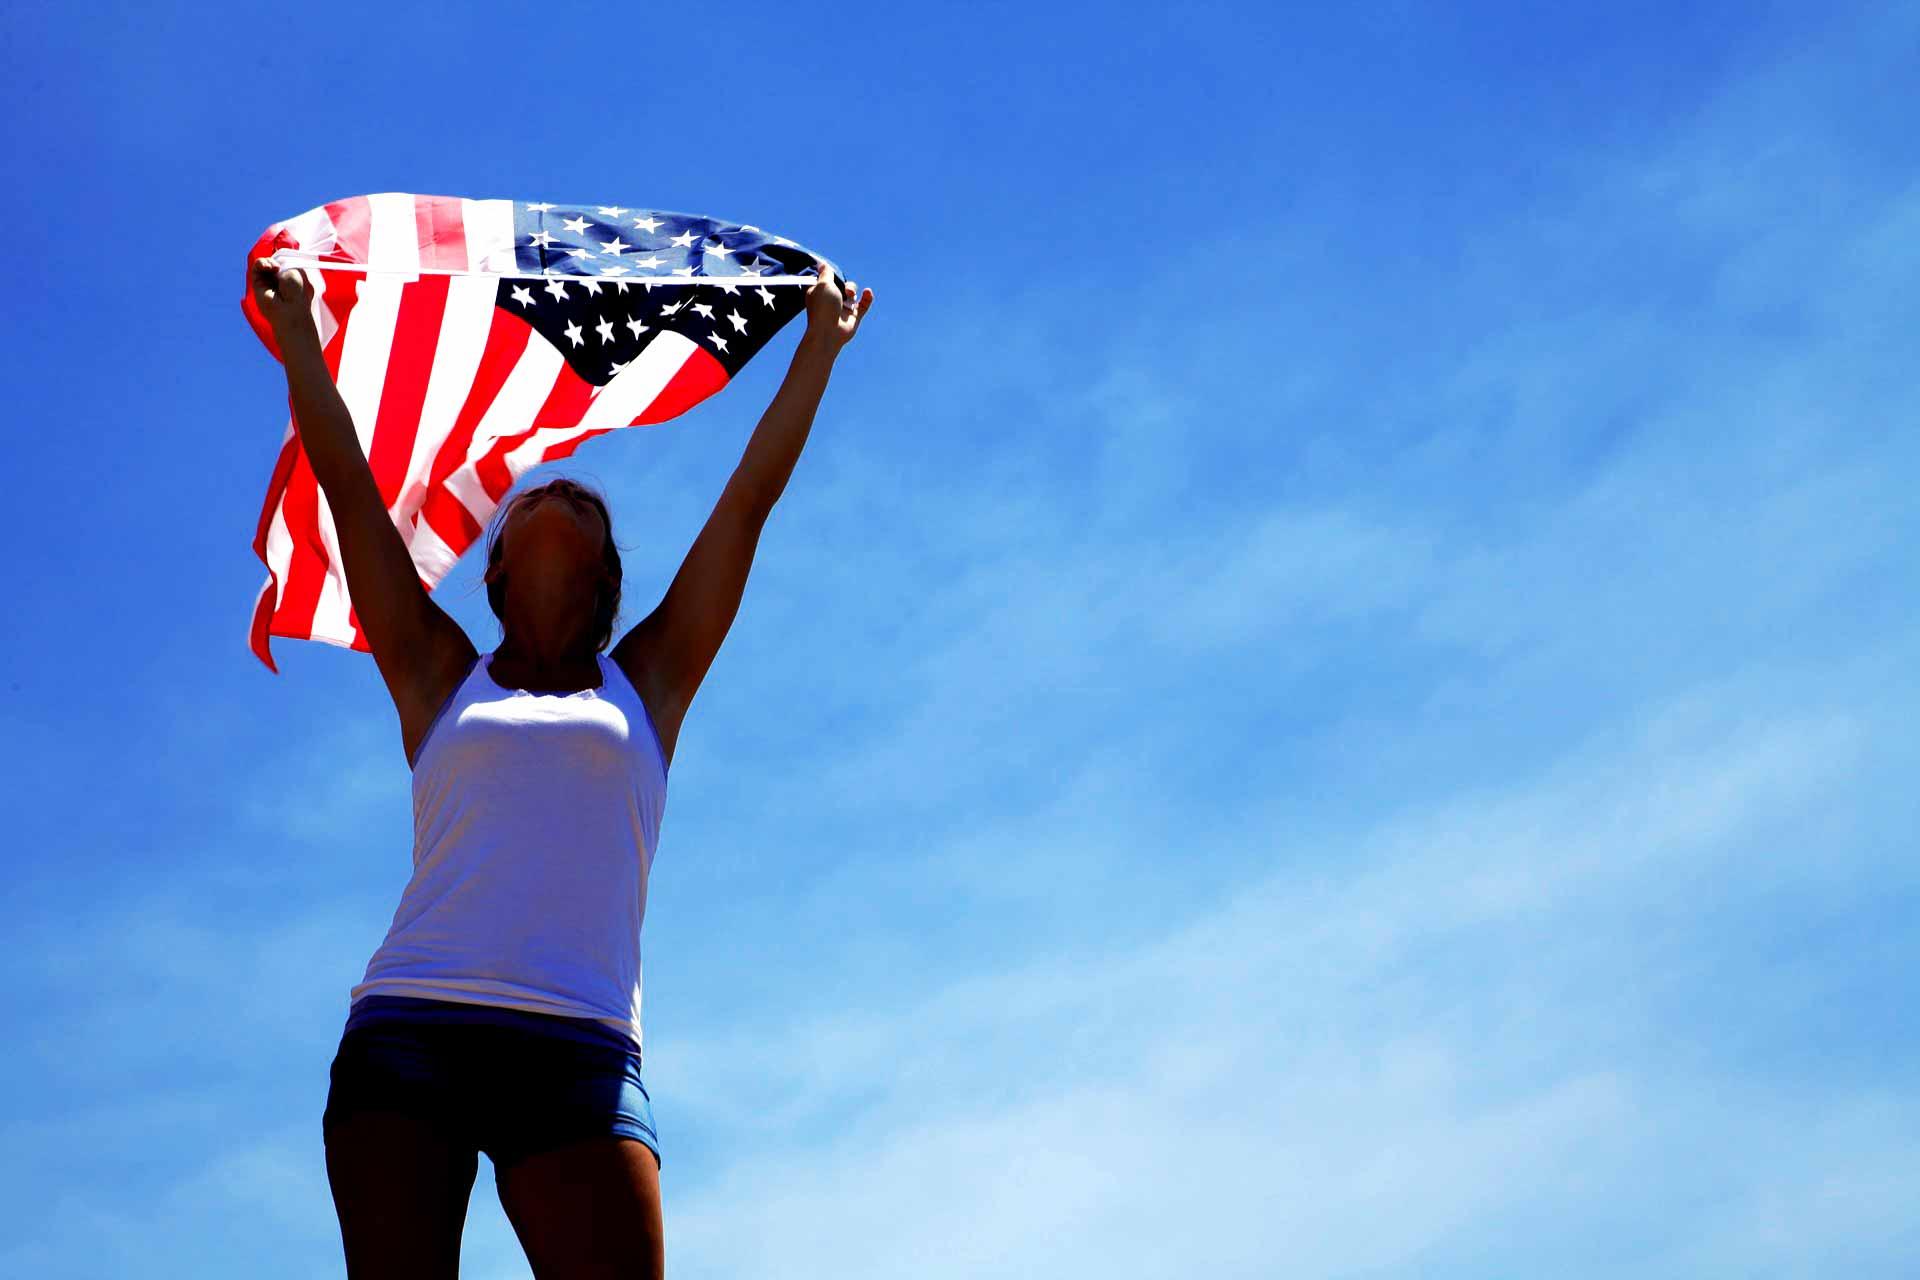 America USA citizen American US flag